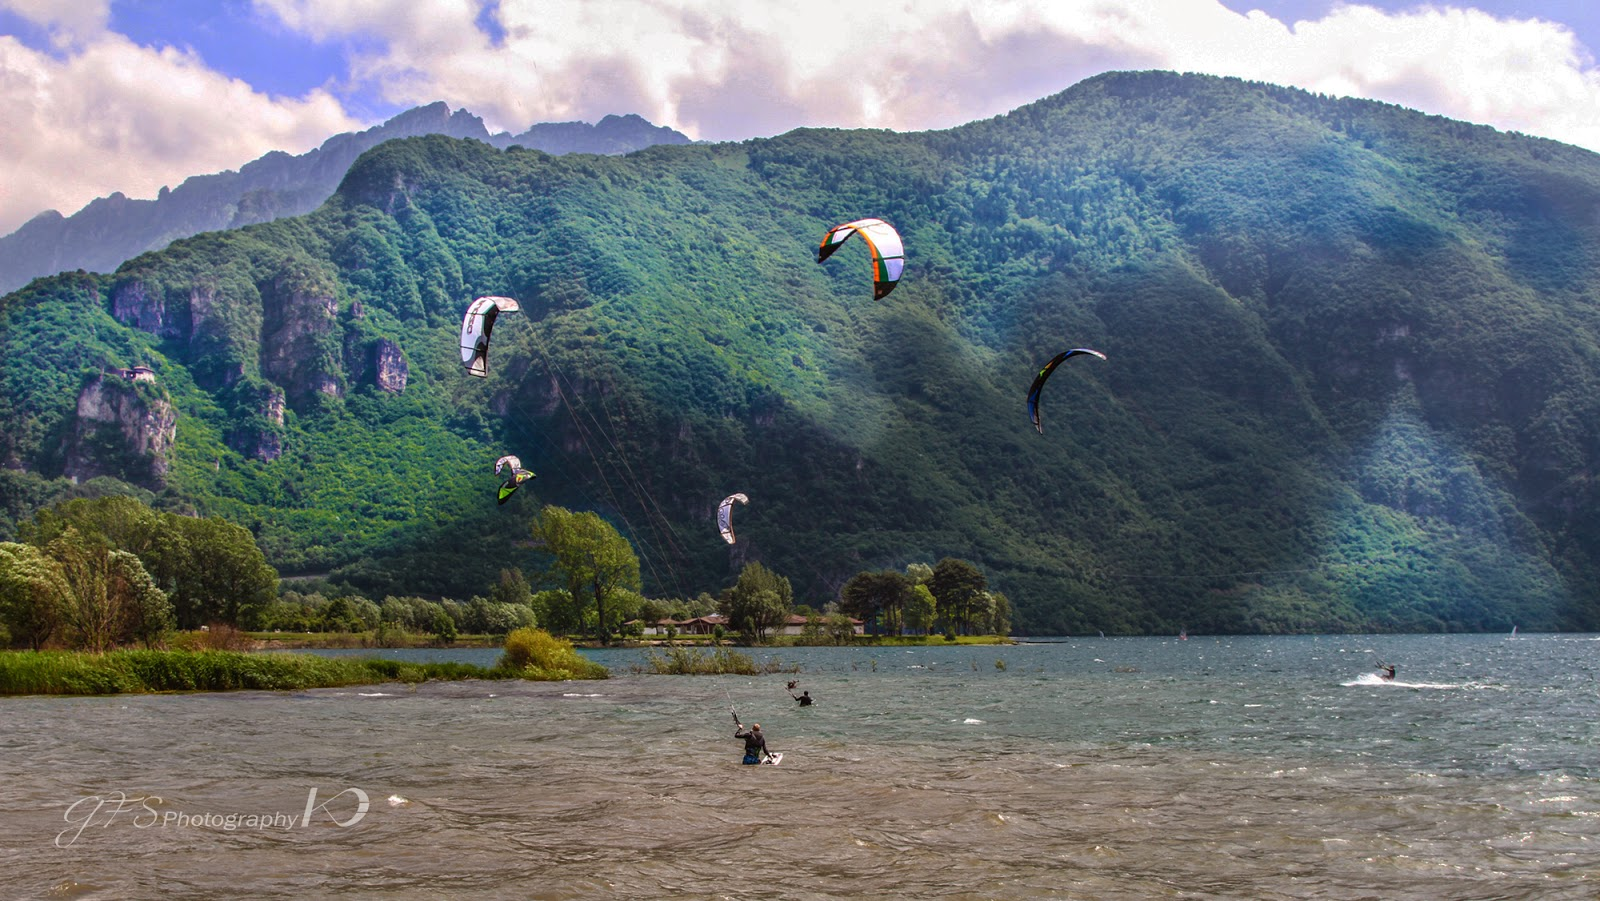 kitesurf, kiteboard, lake, idro, italy, kitesurf lake idro italy